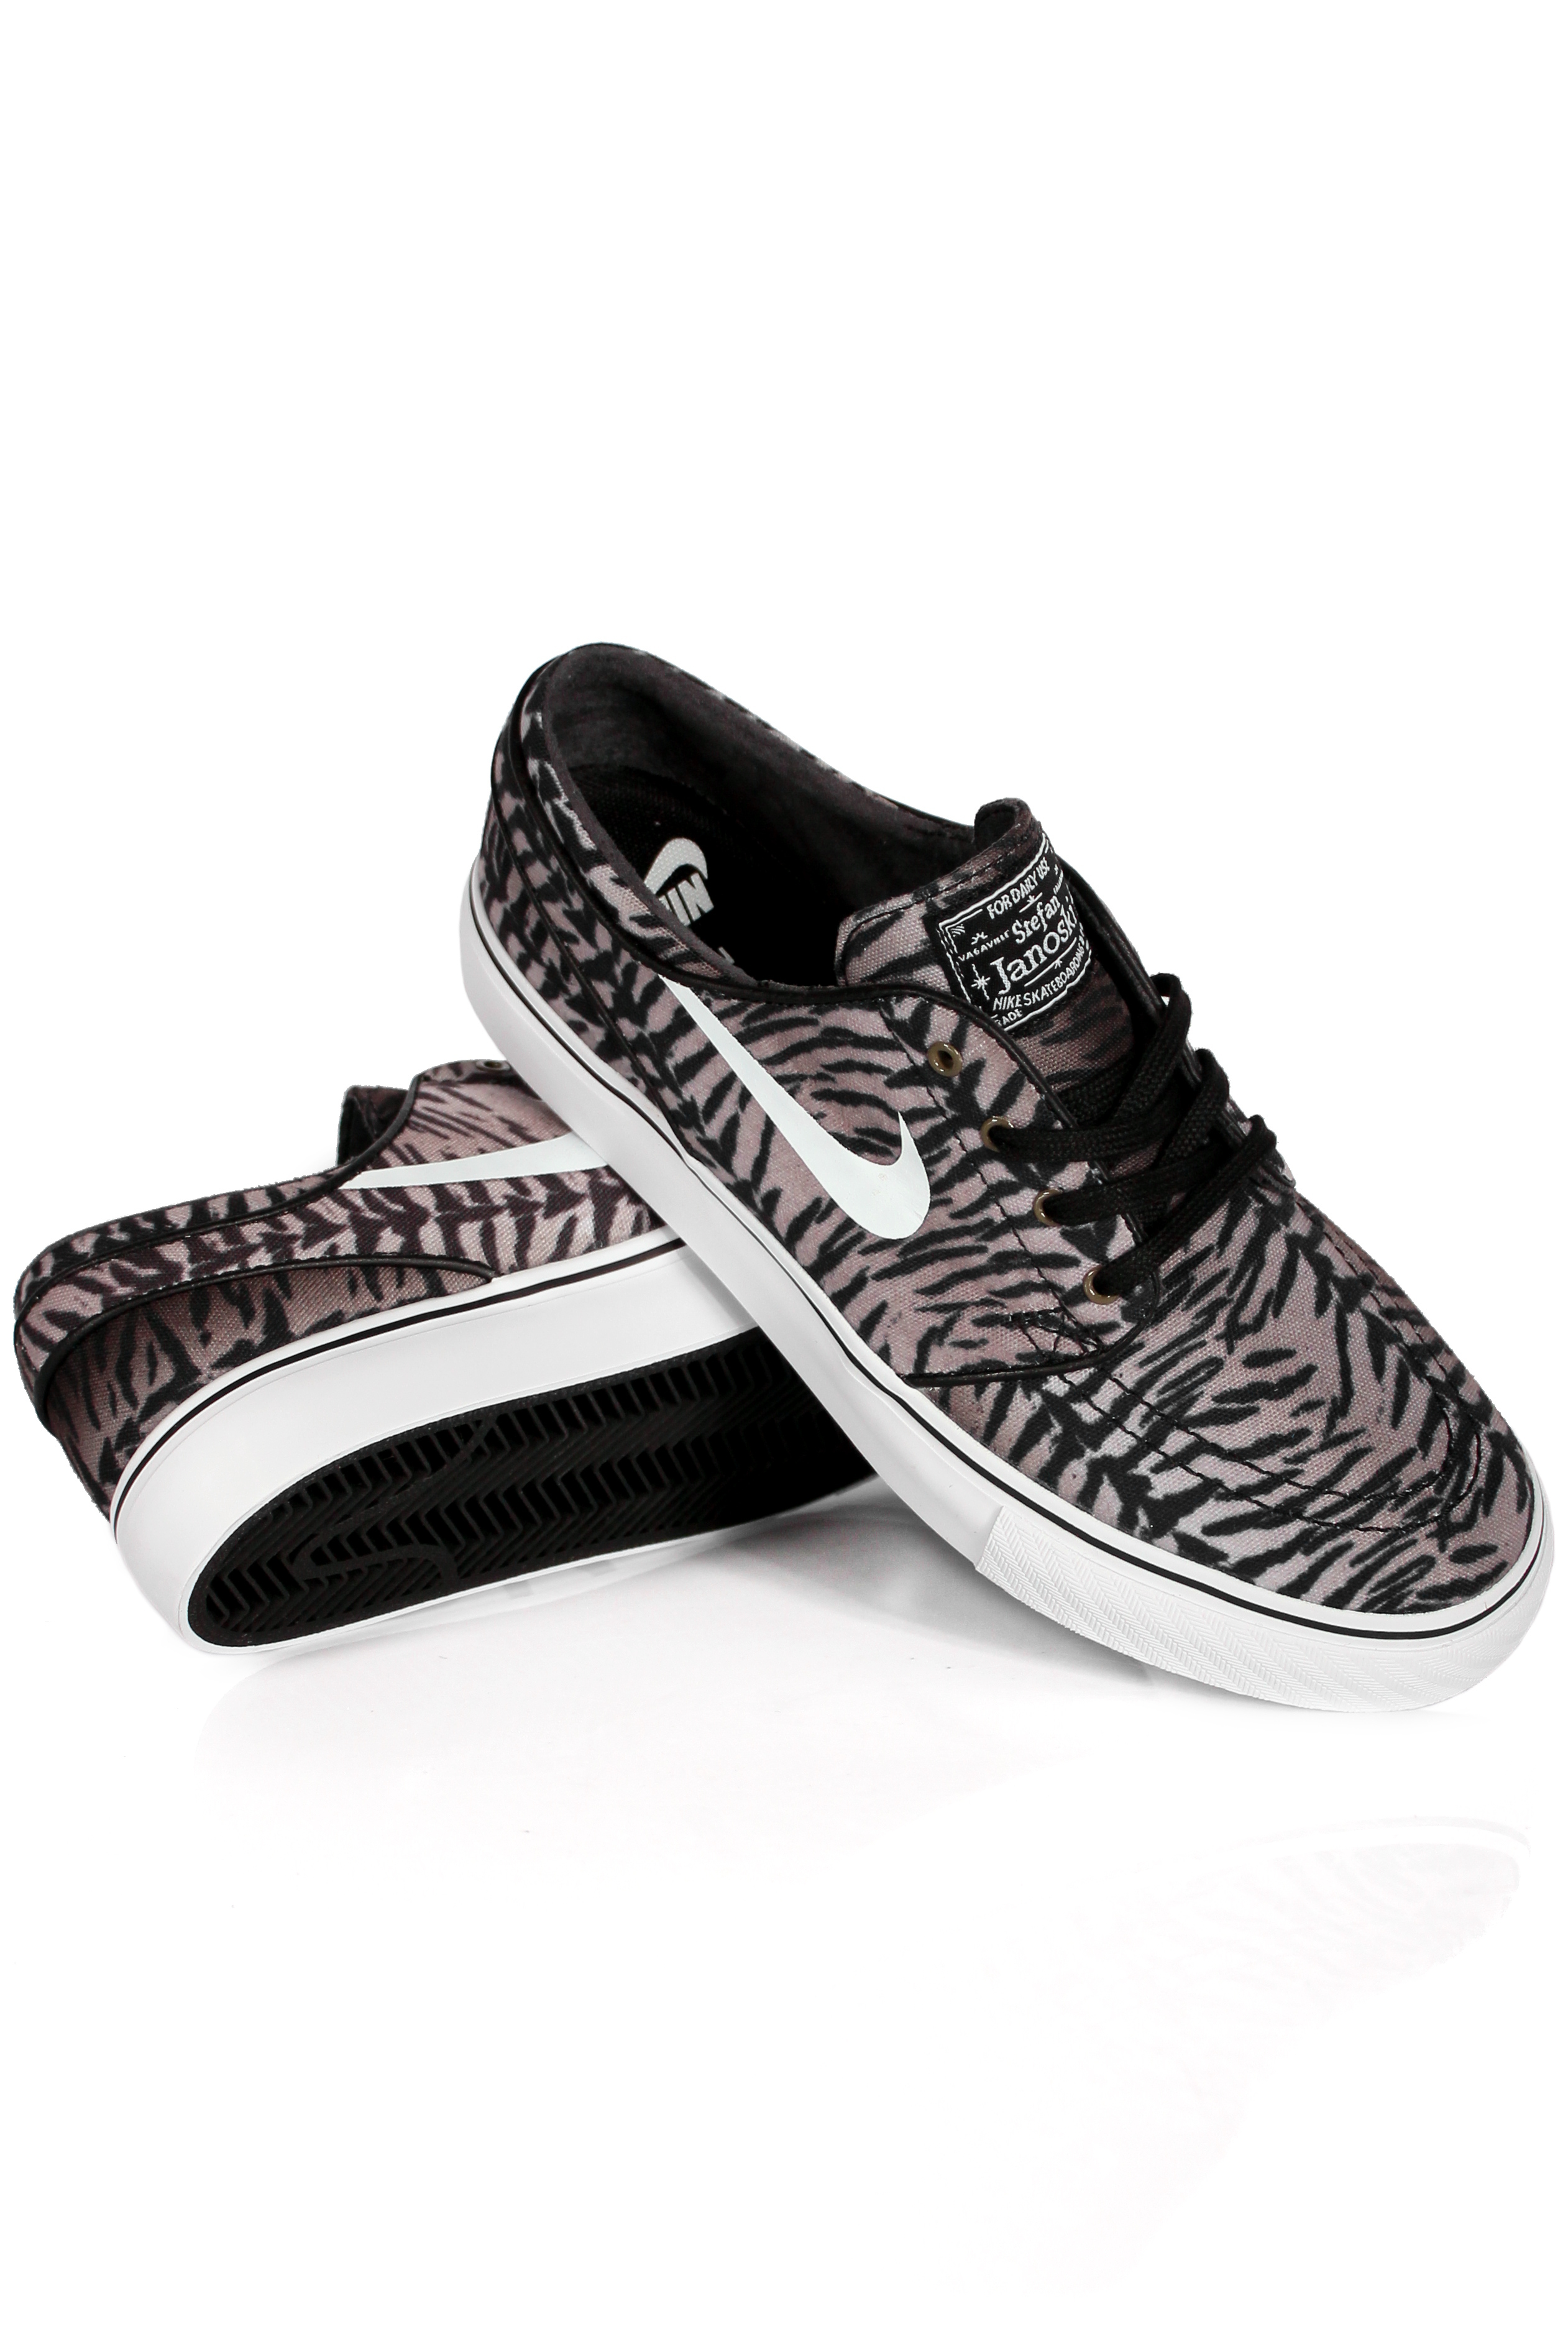 Buty Nike Sb Stefan Janoski (Black/White/ Olive Tiger Camo)